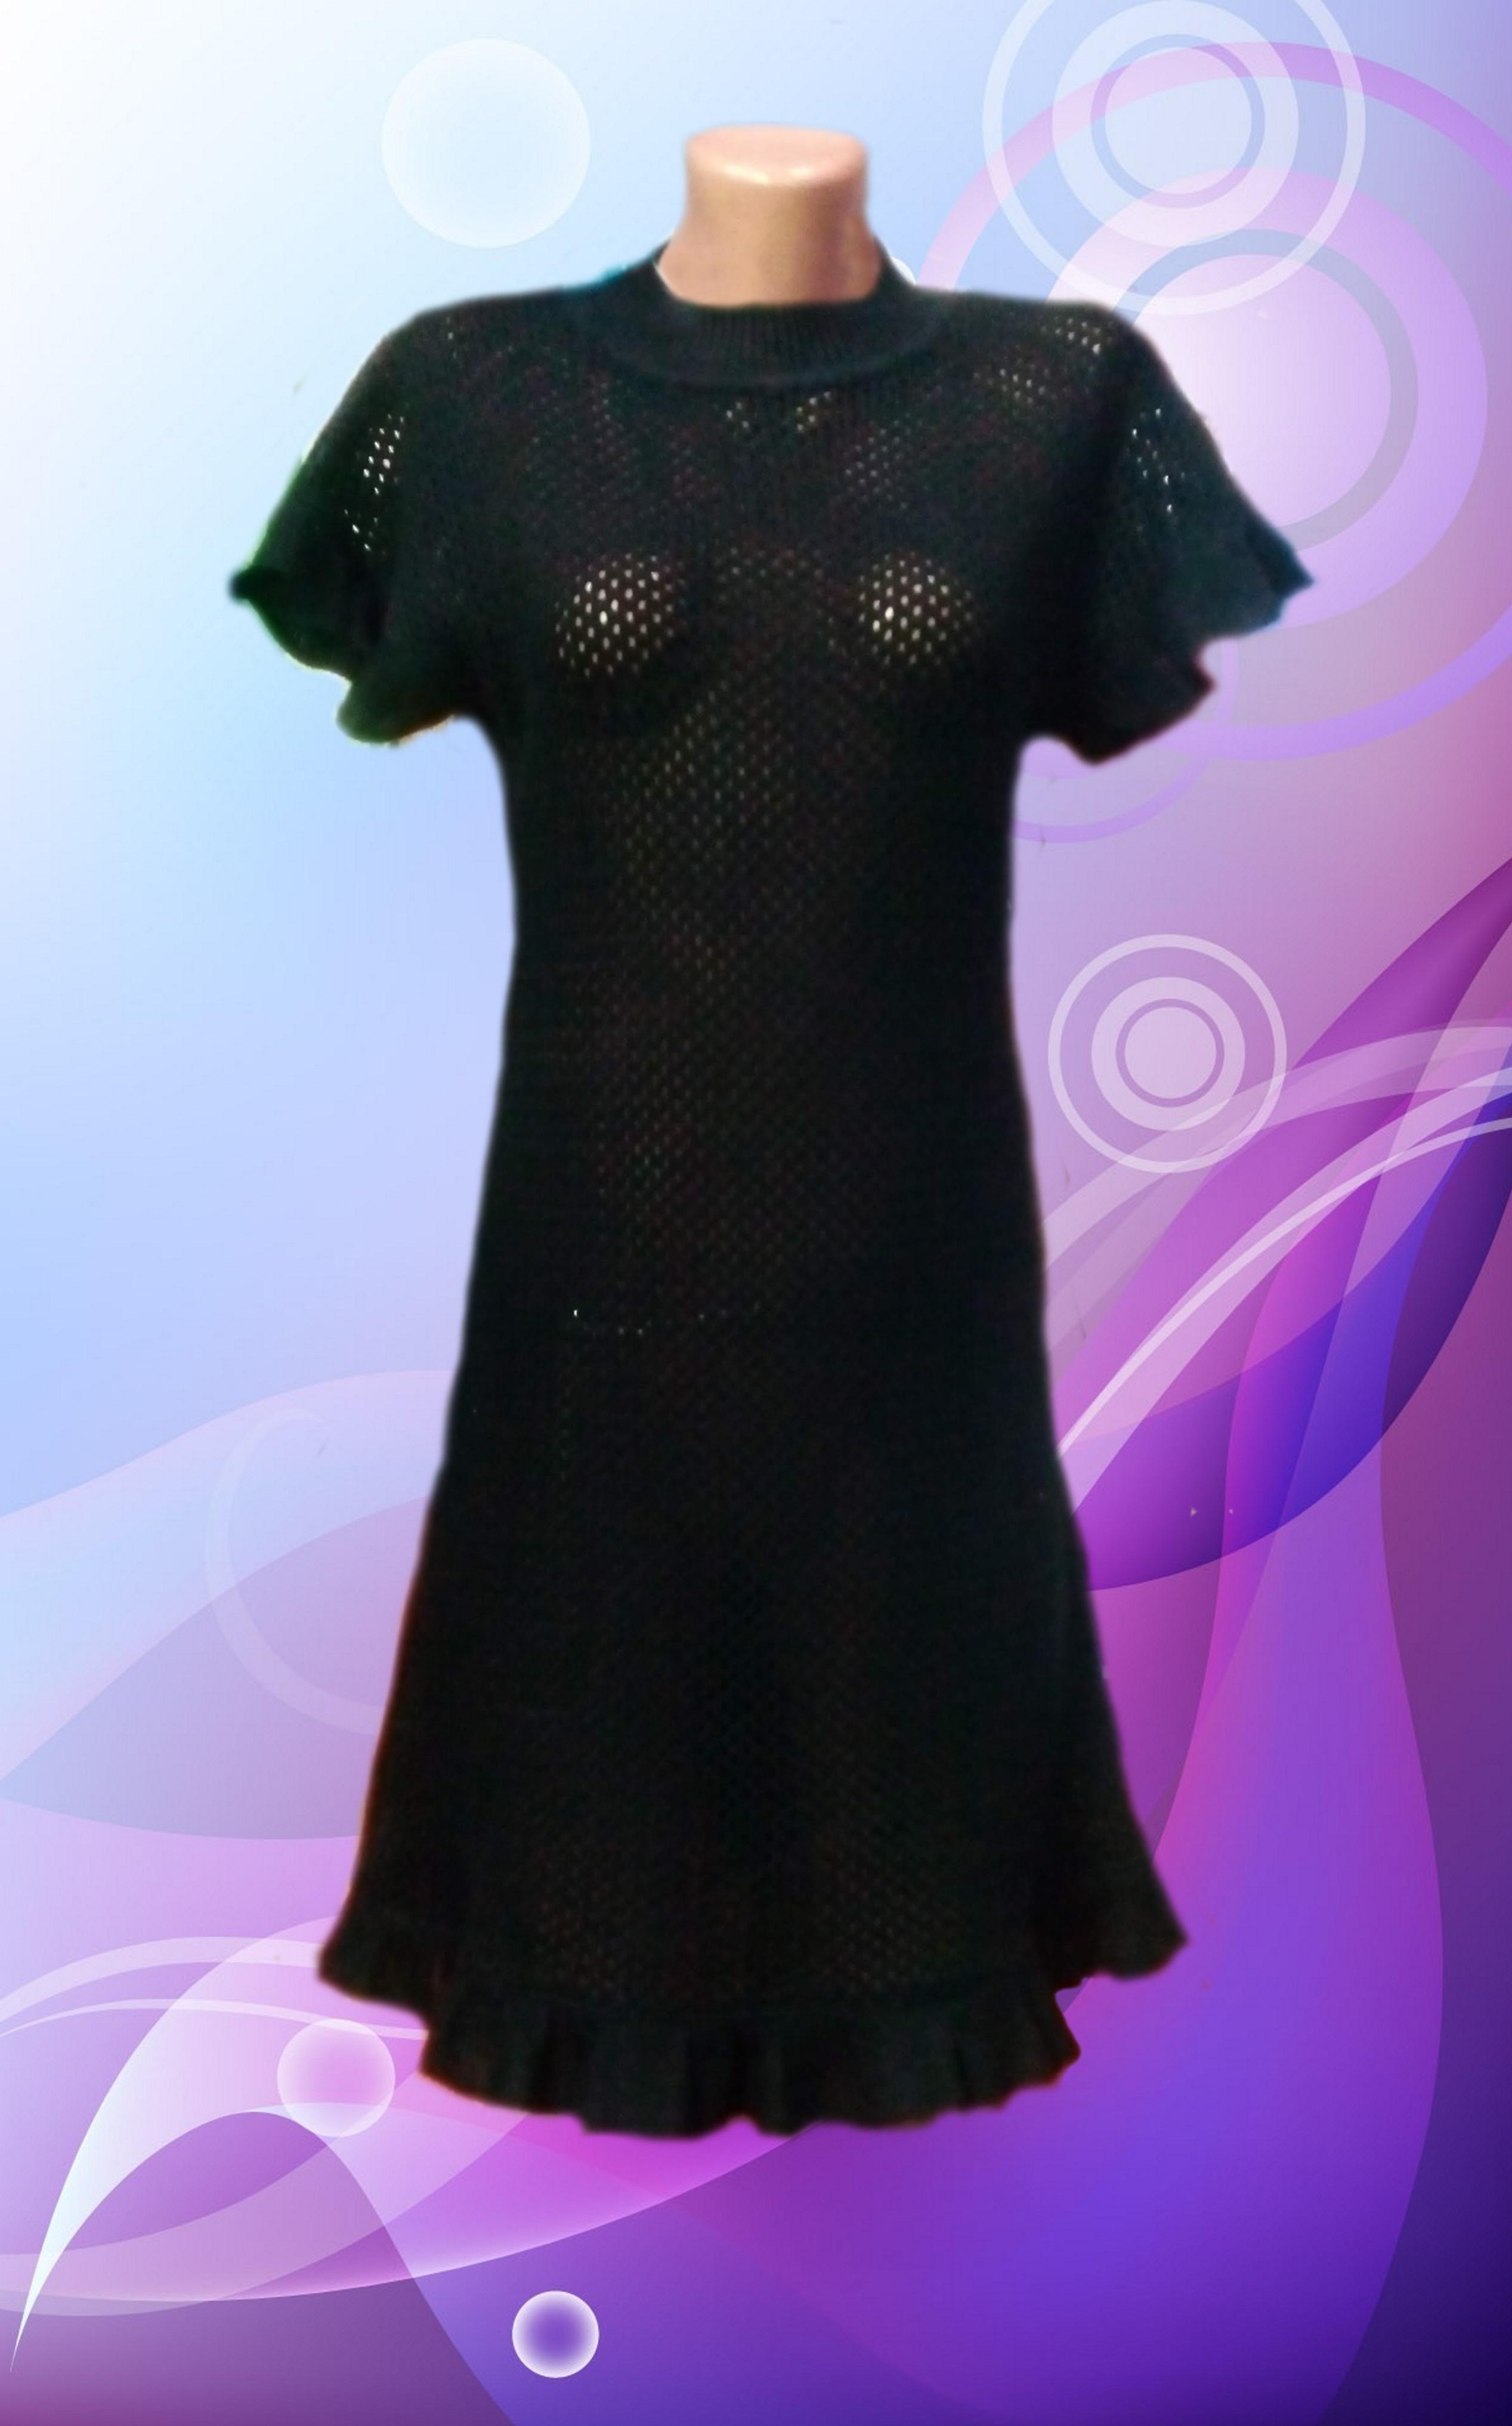 Dress women's mesh knitted image